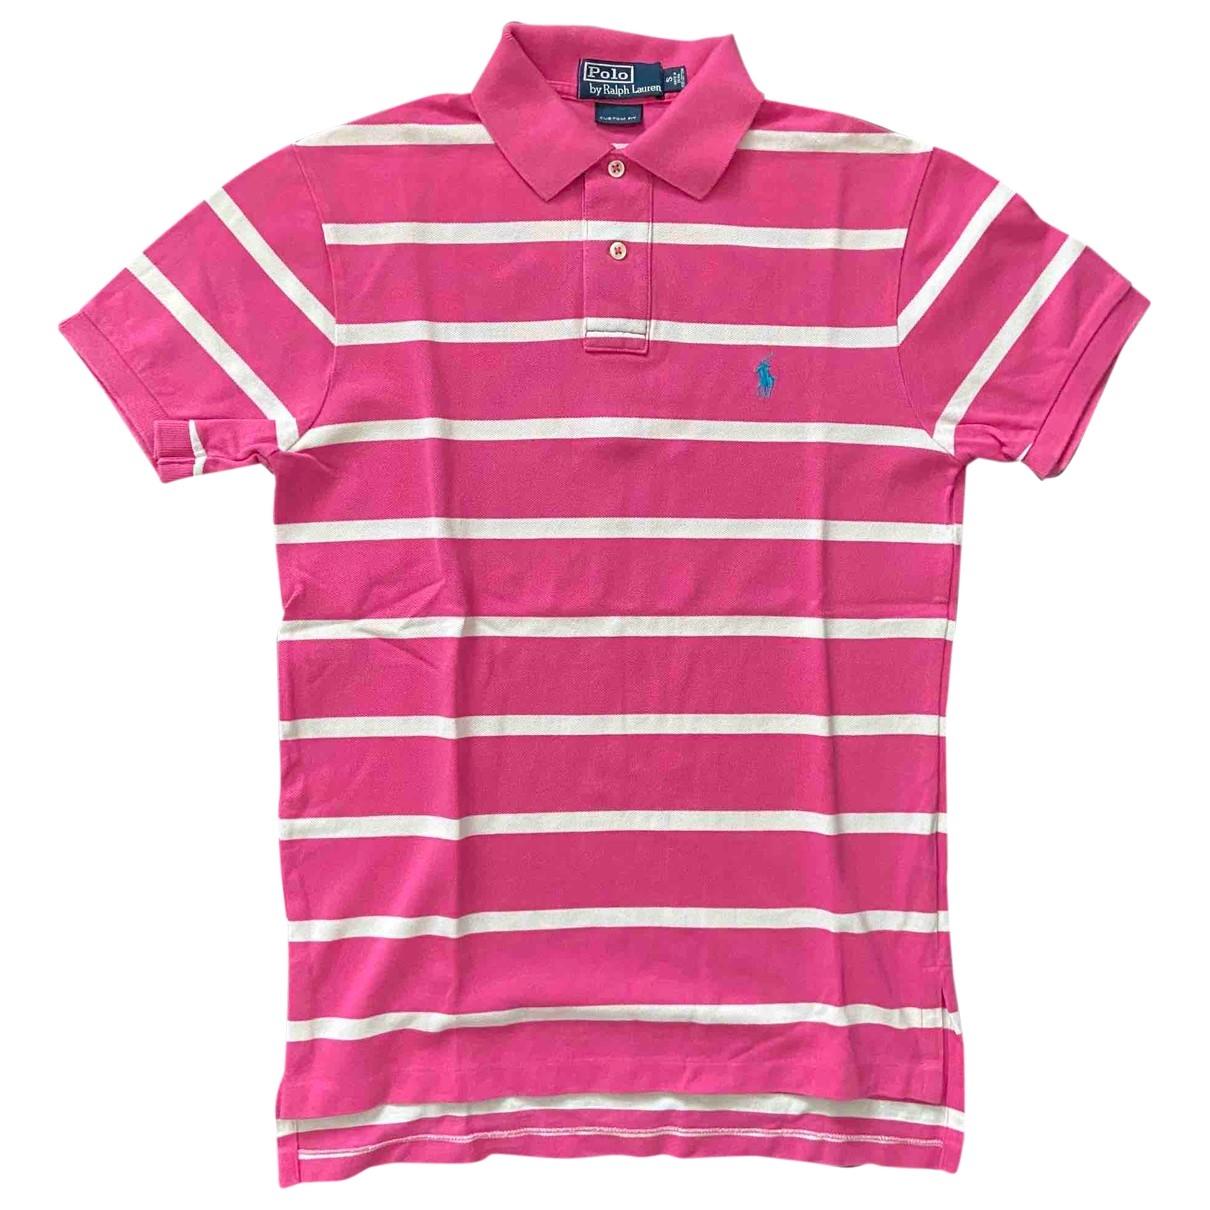 Polo Ralph Lauren - Polos Polo Rugby manches courtes pour homme en coton - rose